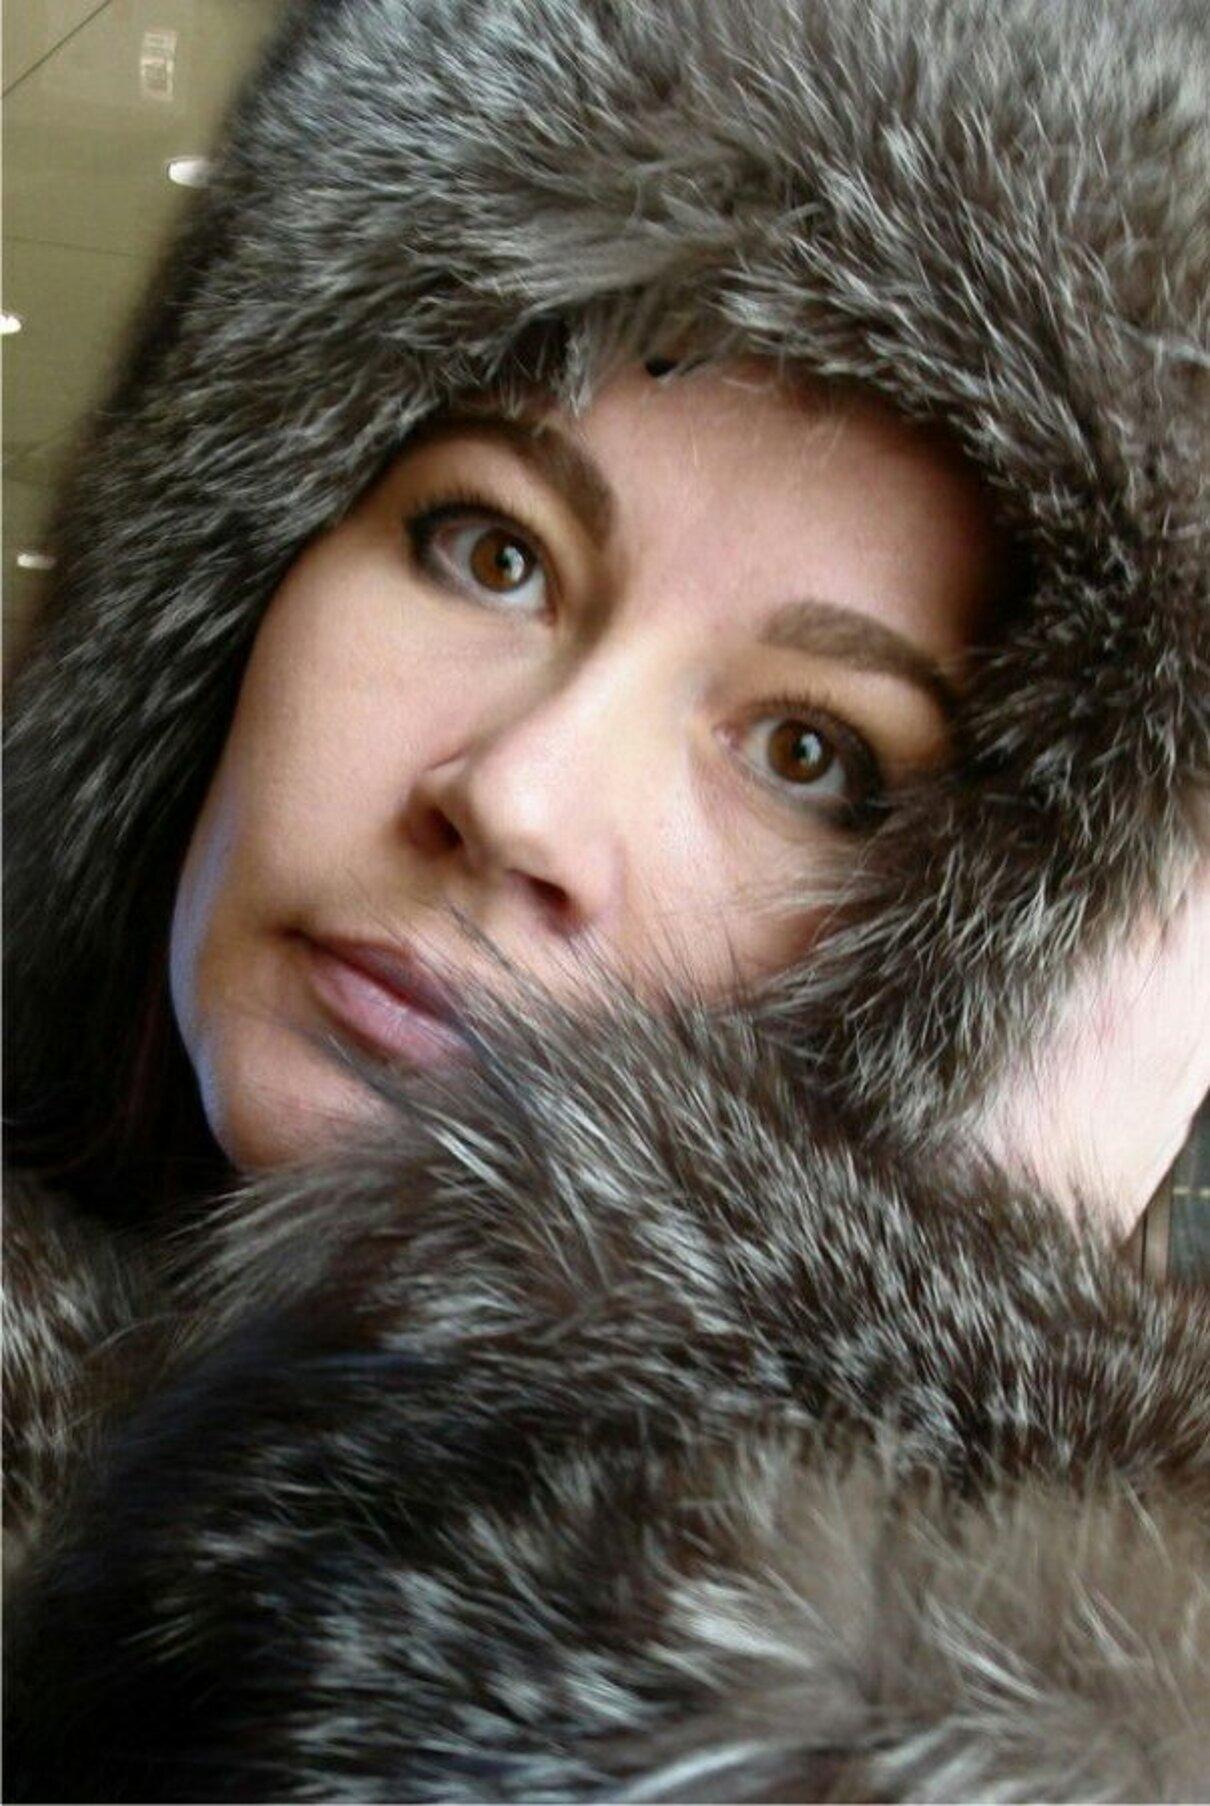 Жалоба-отзыв: Белоногова Ольга Петровна - Аферистка.  Фото №2